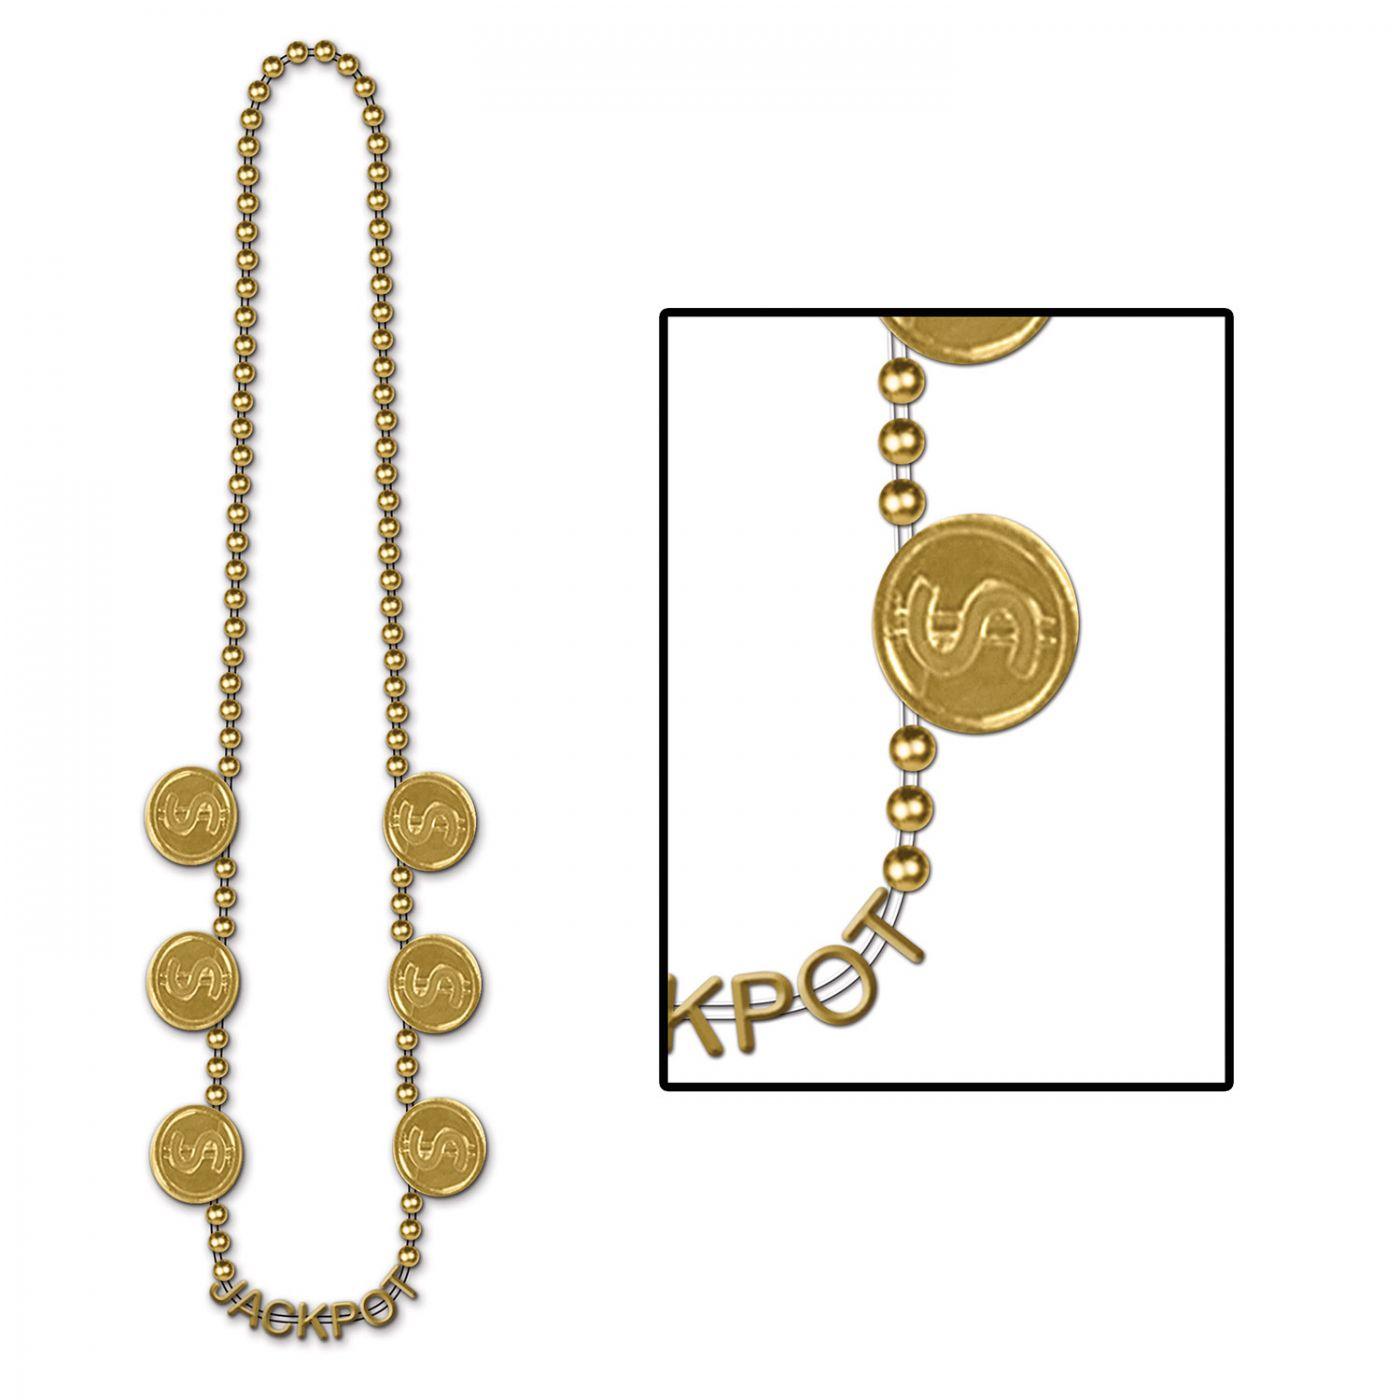 Jackpot Beads image